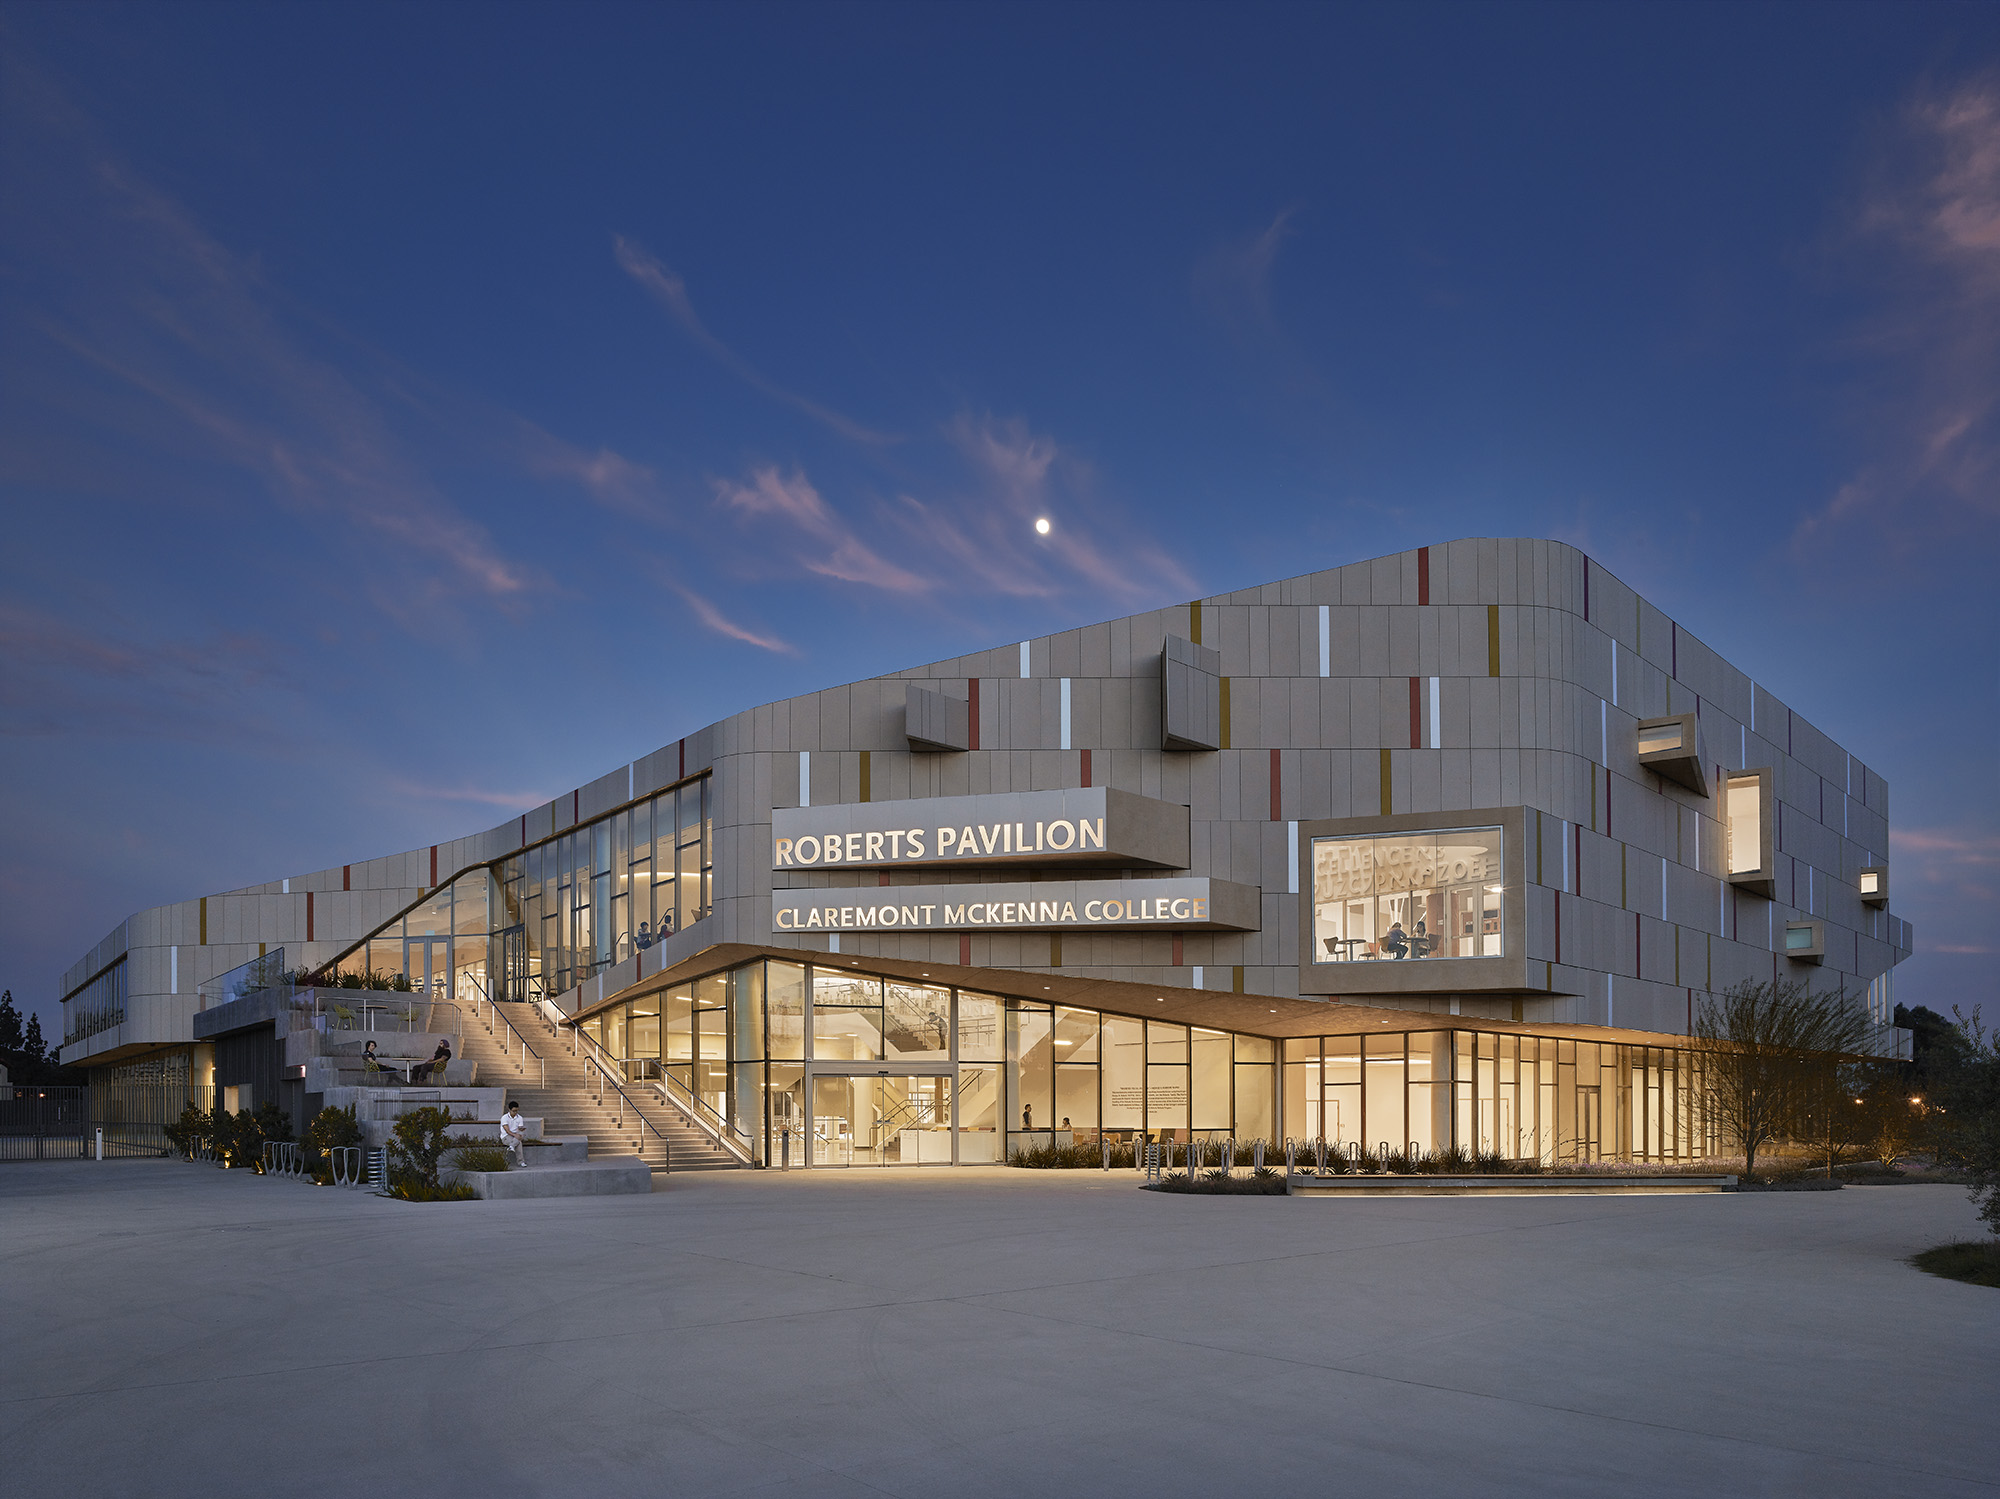 Claremont McKenna College dedicates Roberts Pavilion — JFAK